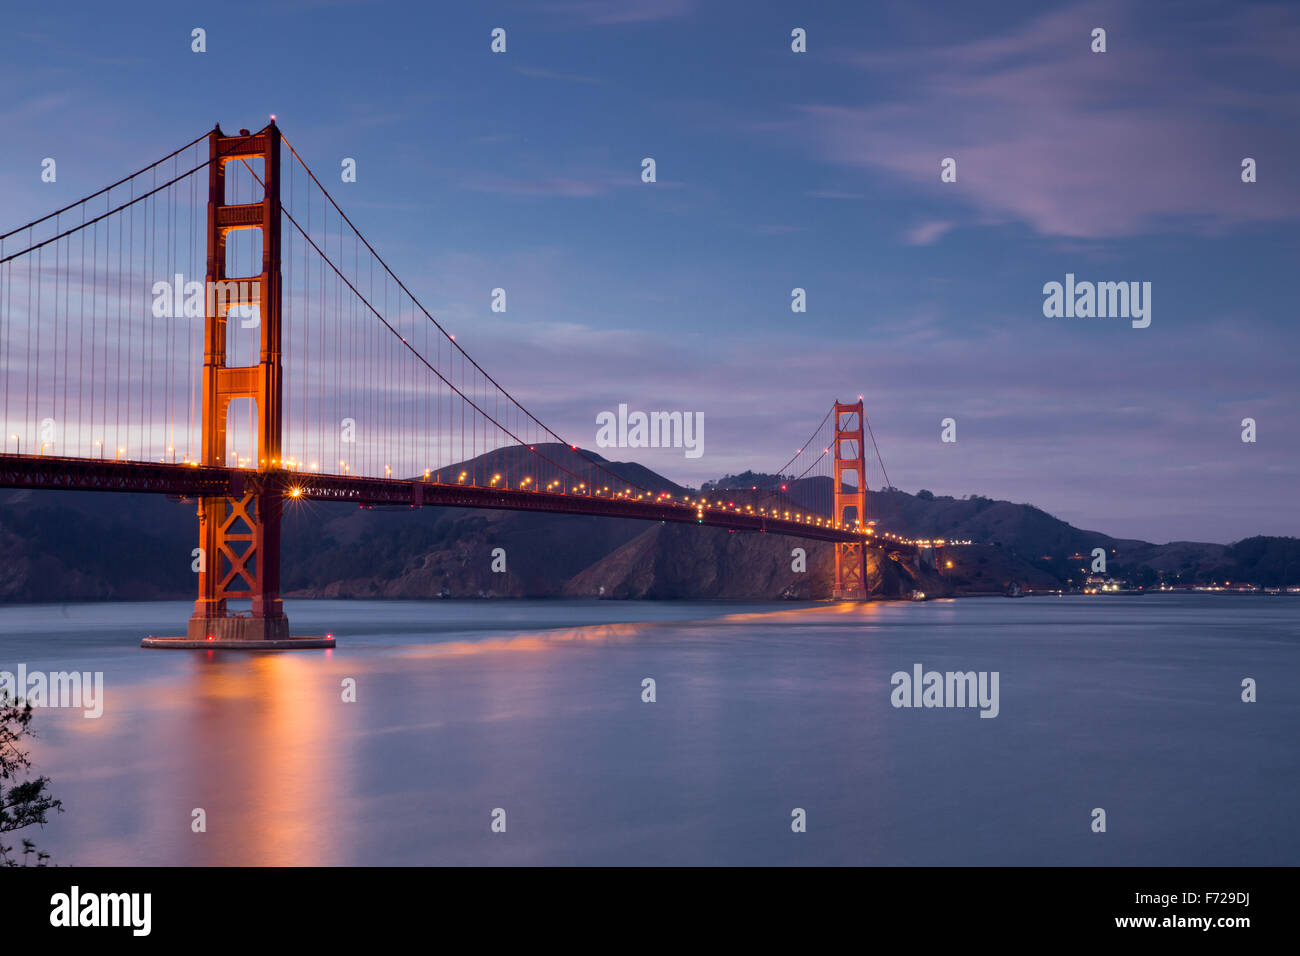 Golden-Gate Bridge at Dusk, San Francisco, California - Stock Image